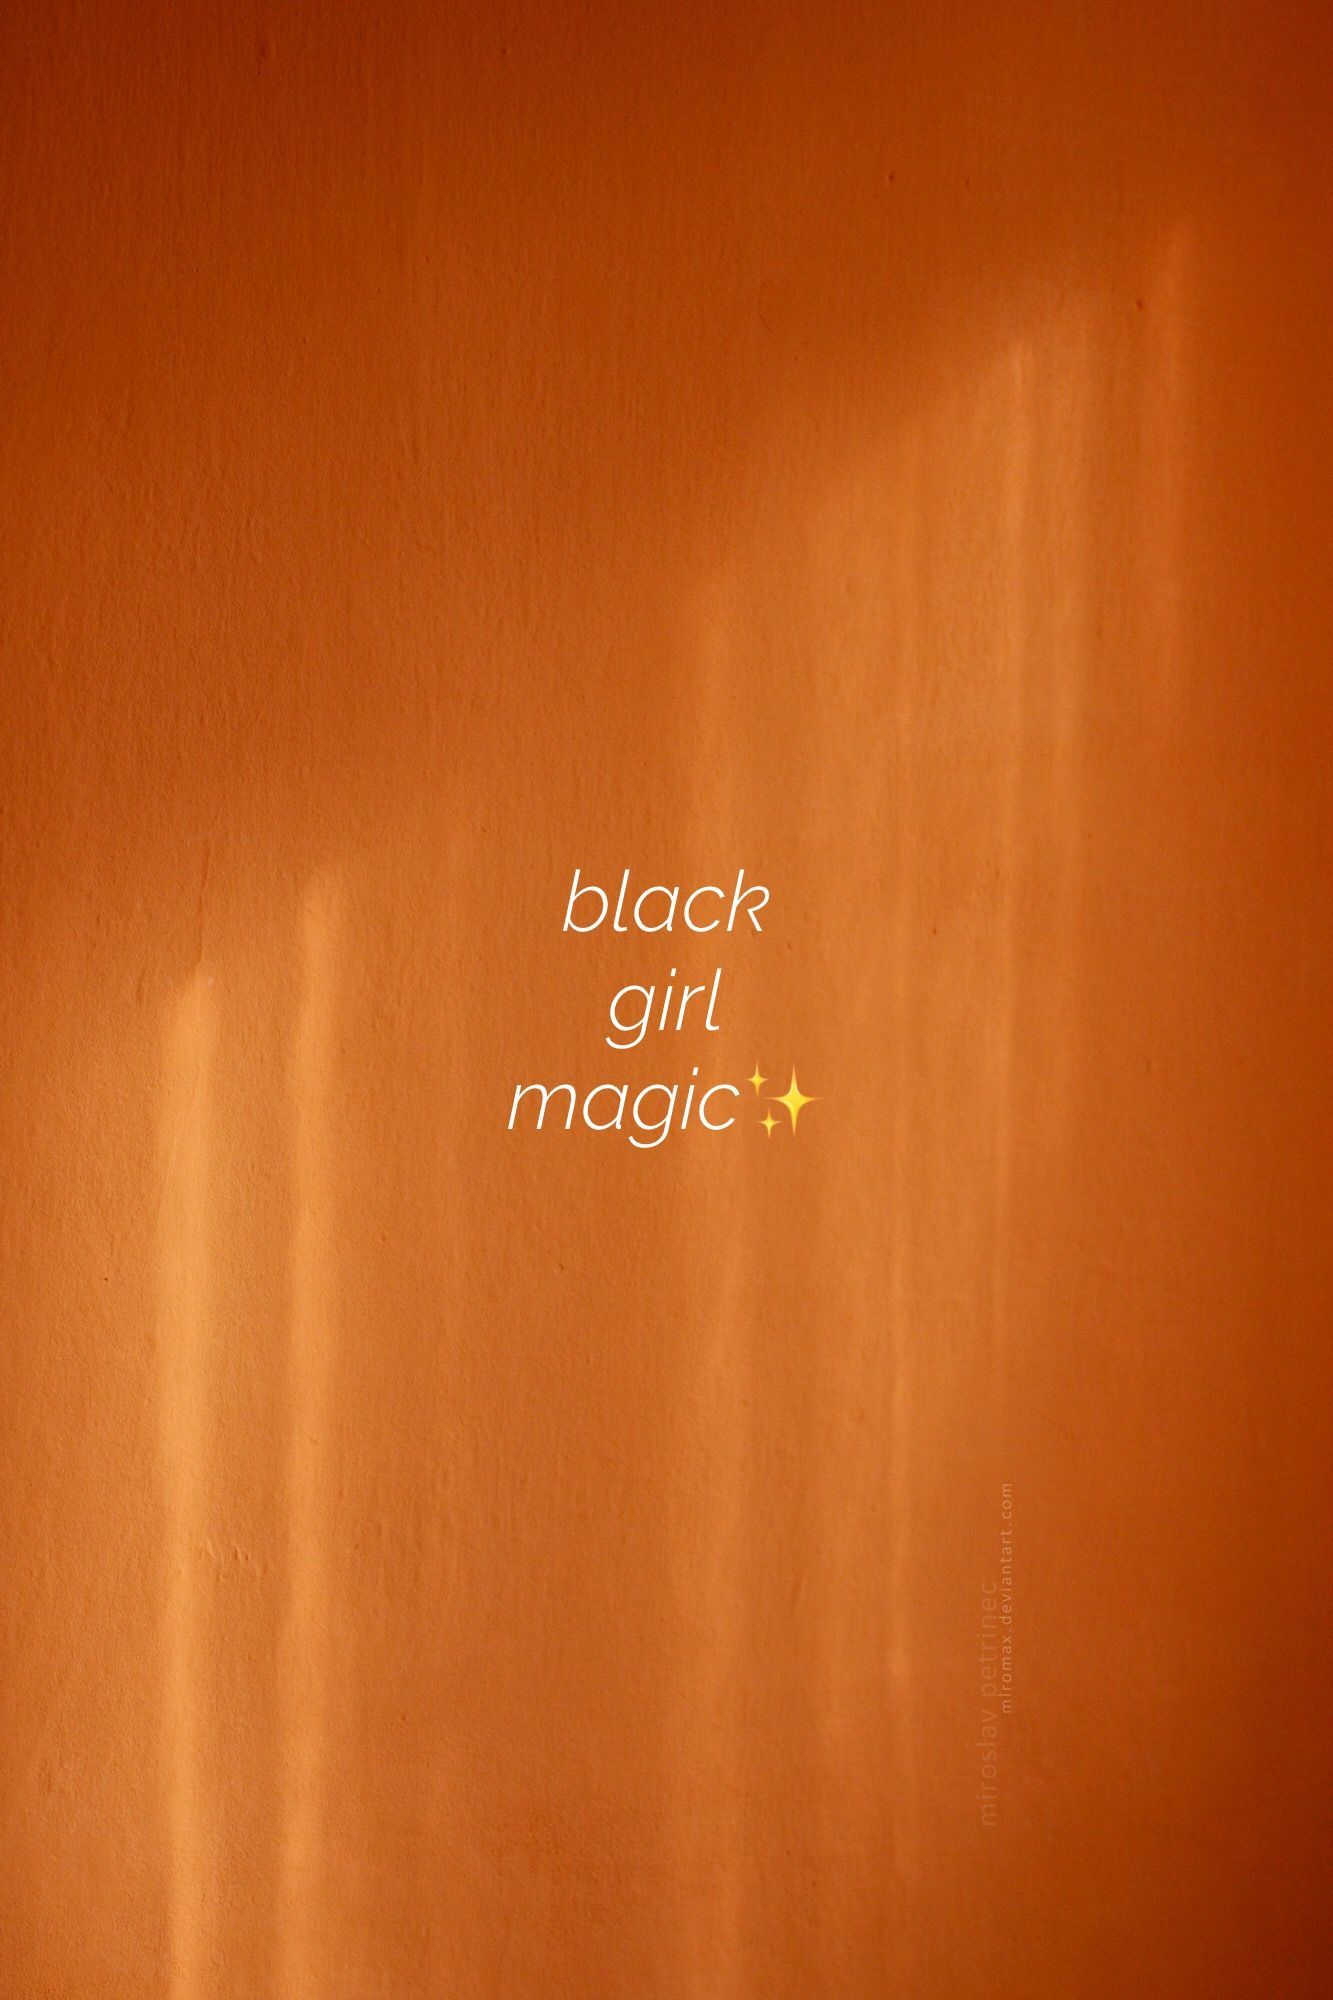 Girl magic wallpaper black Kelly Finley